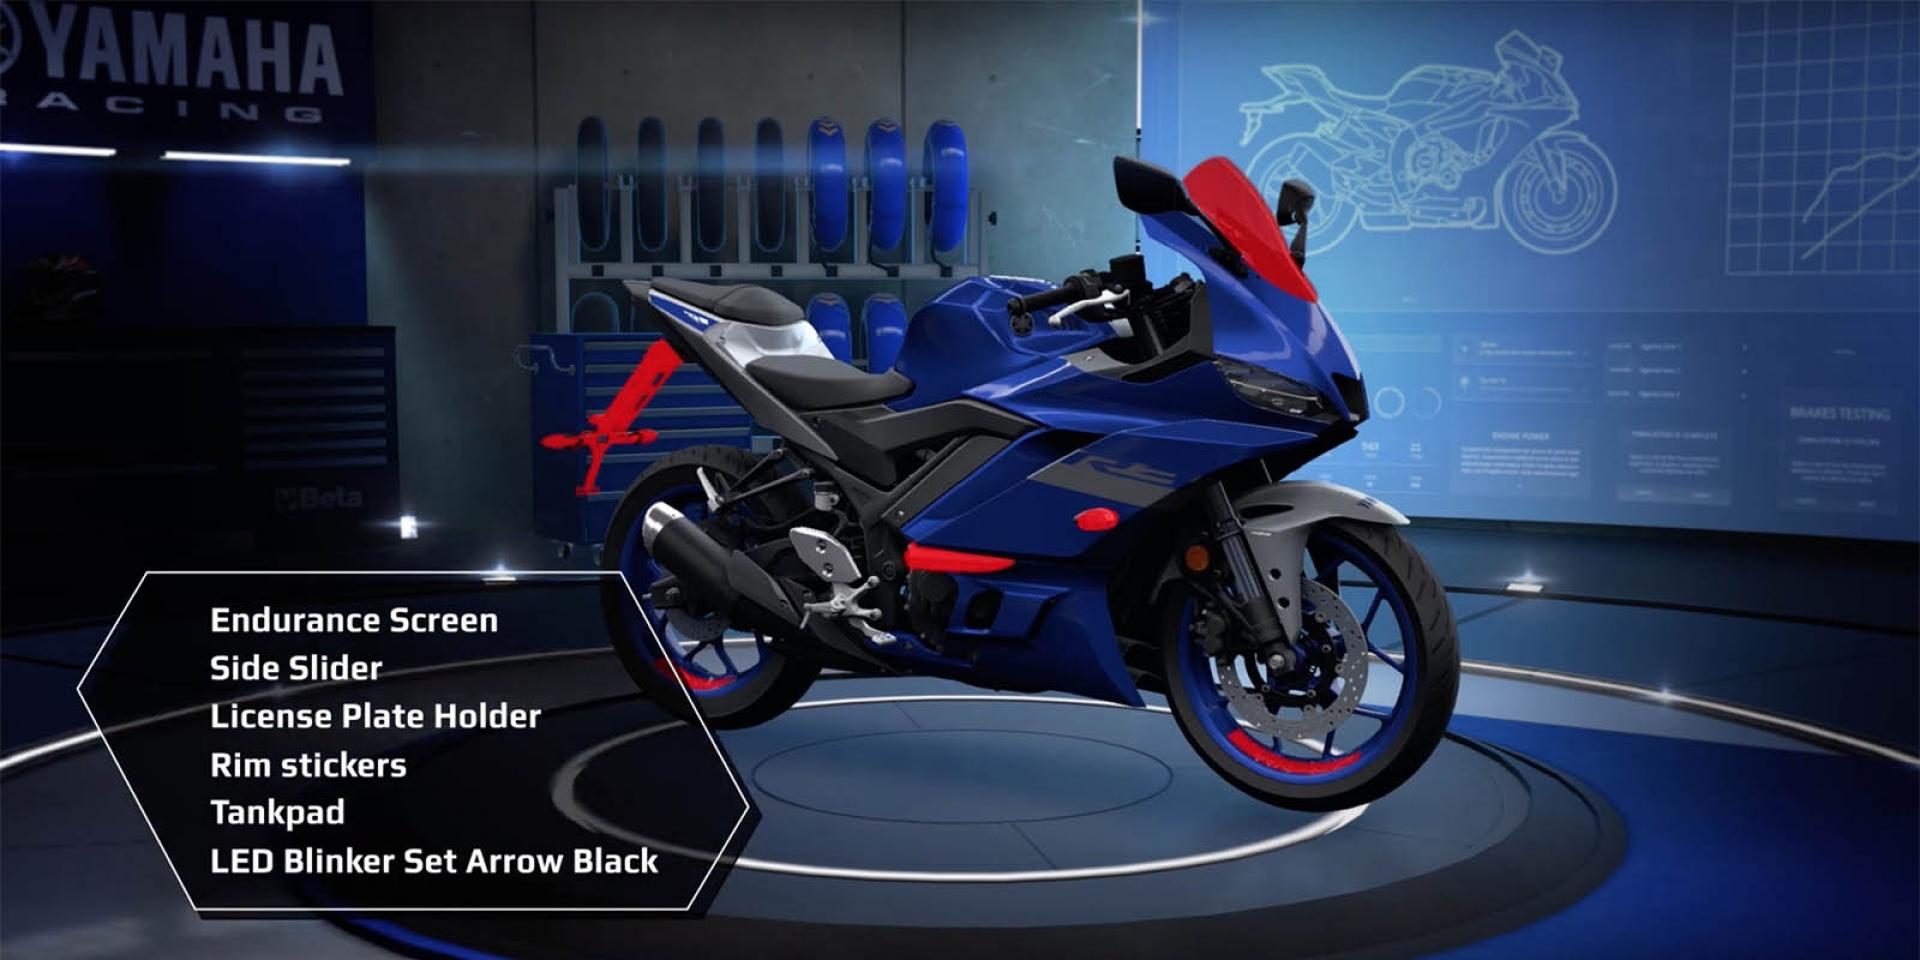 YAMAHA R3歐洲推出Sport Pack,台灣山葉選配件似乎更超值!